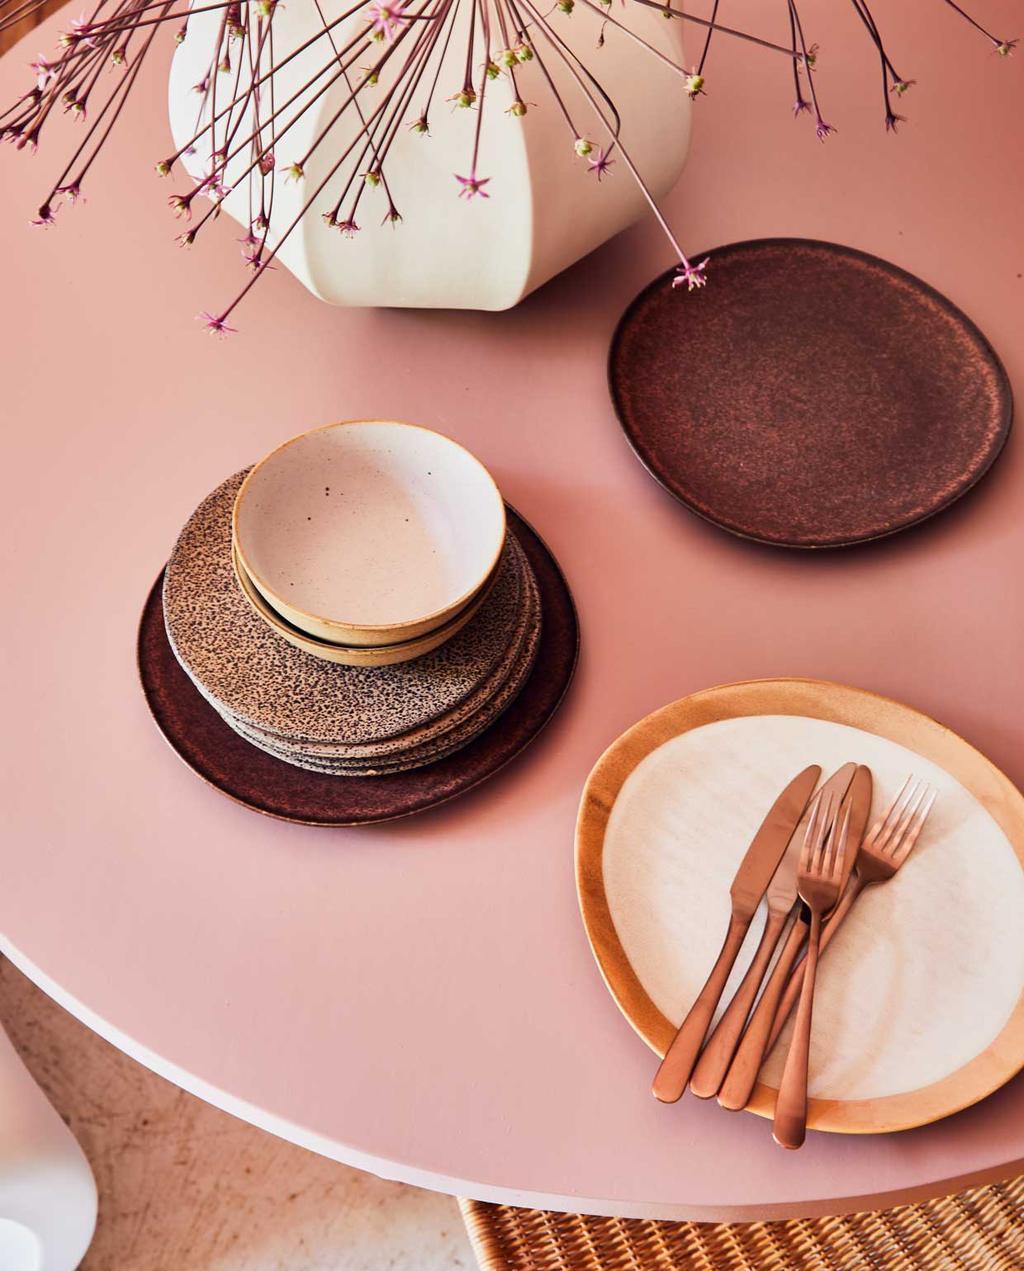 vtwonen 09-2020 | styling | Marokkaanse sfeer | eettafel met servies